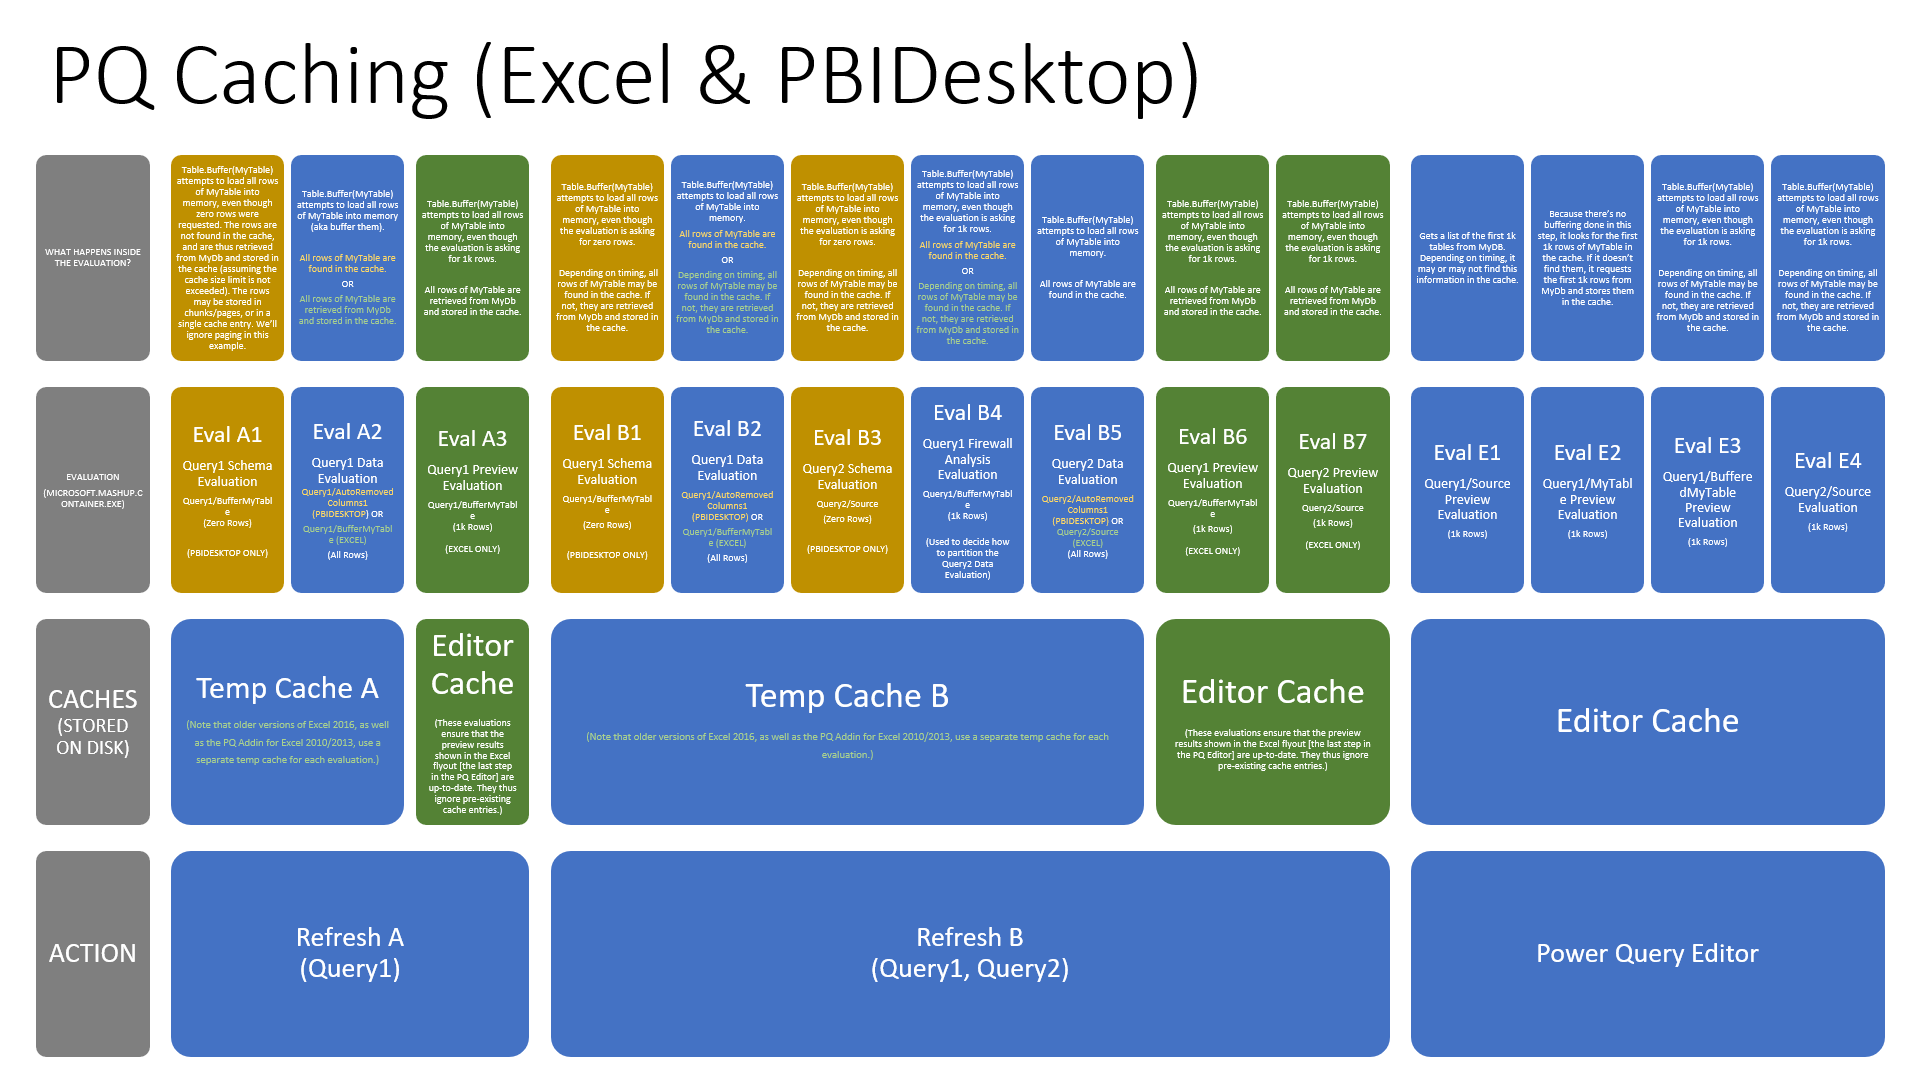 PQ Caching (Excel & PBIDesktop)